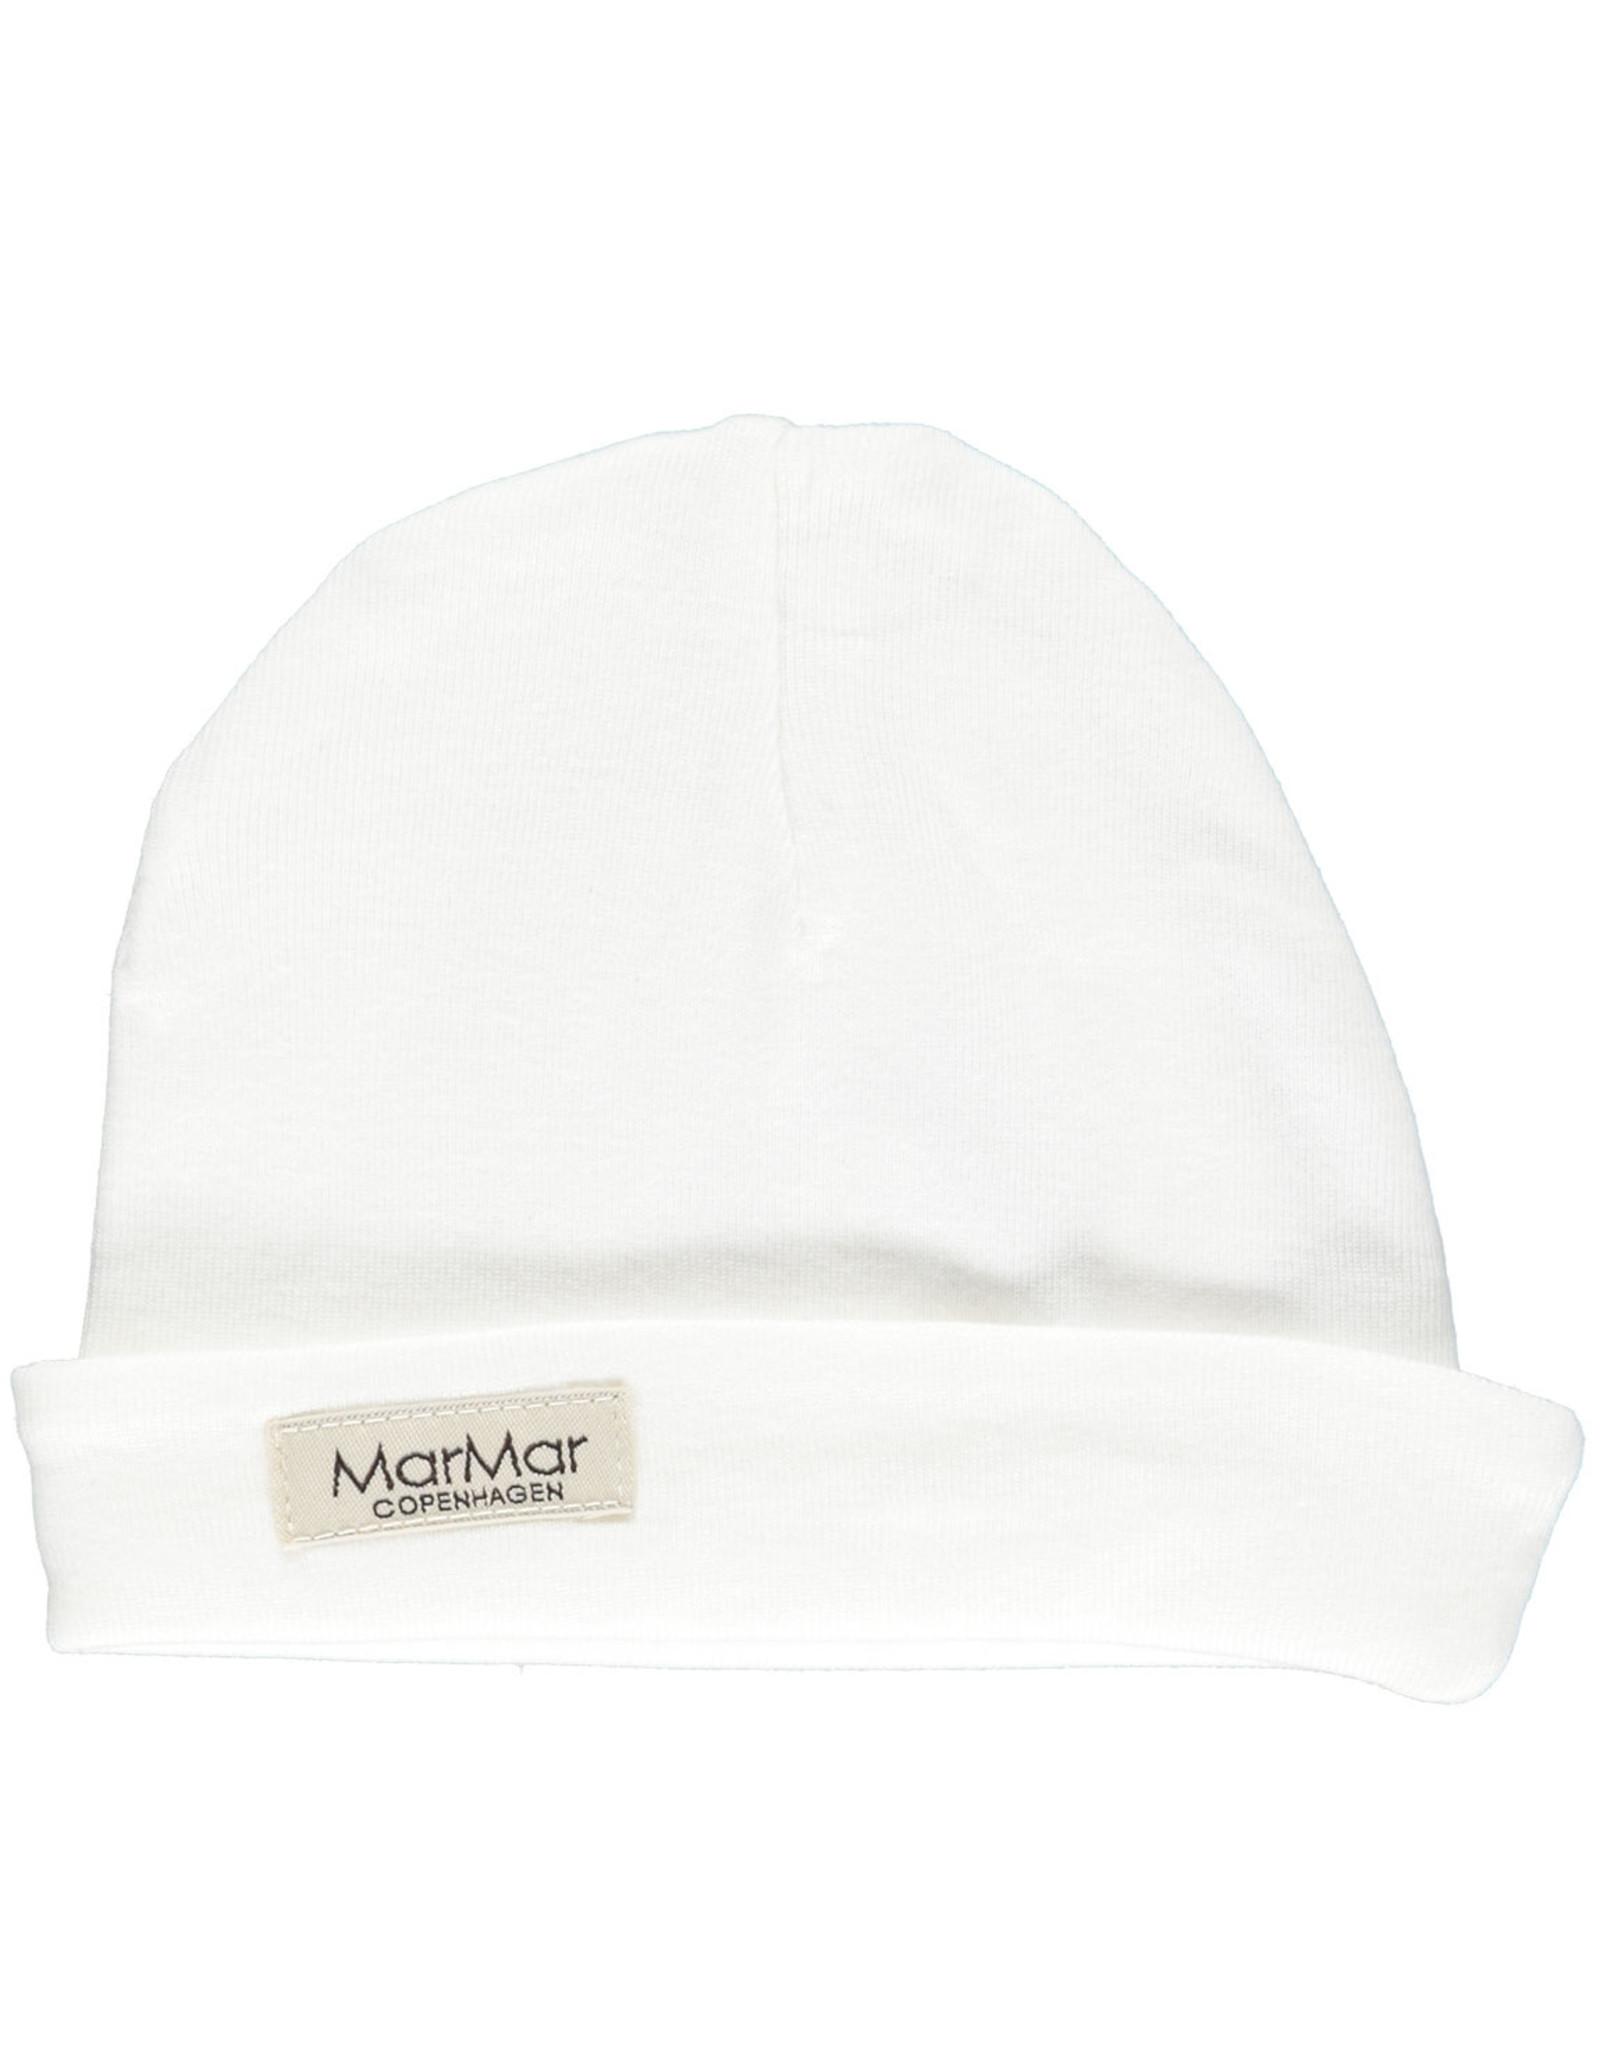 MarMar MarMar - Aiko - Gentle White